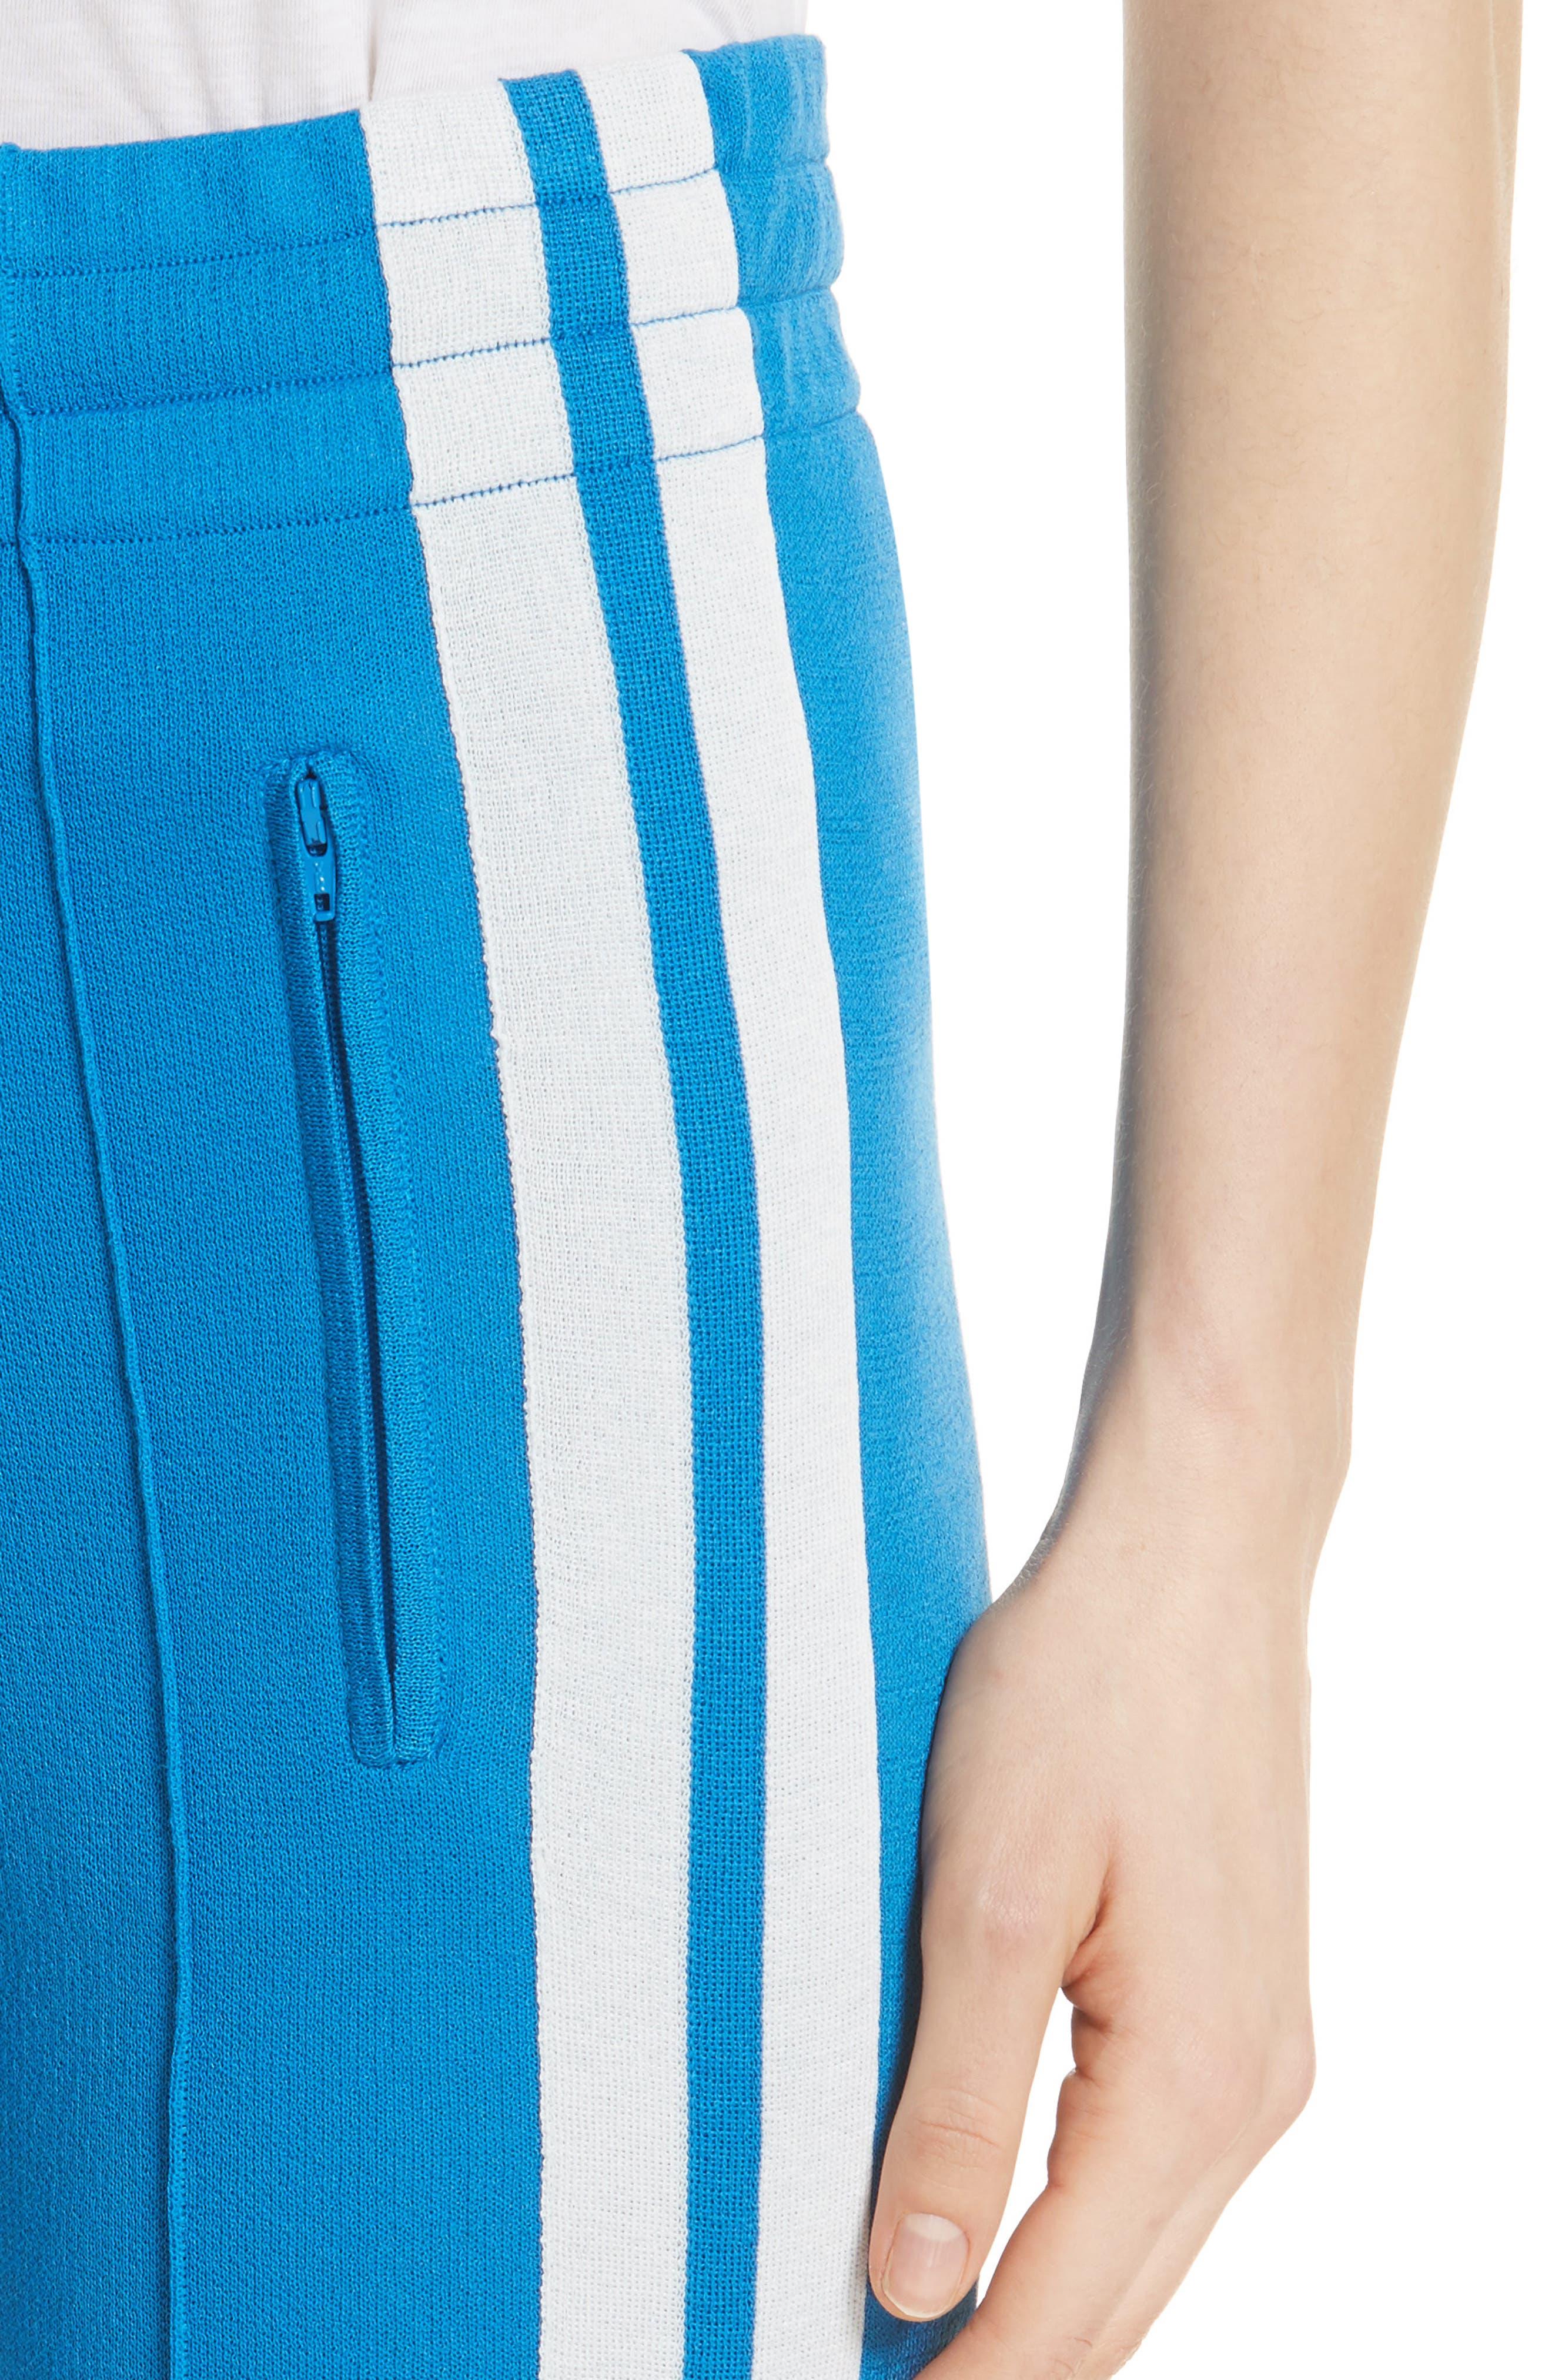 Isabel Marant Étoile Dobbs Pants,                             Alternate thumbnail 5, color,                             Electric Blue